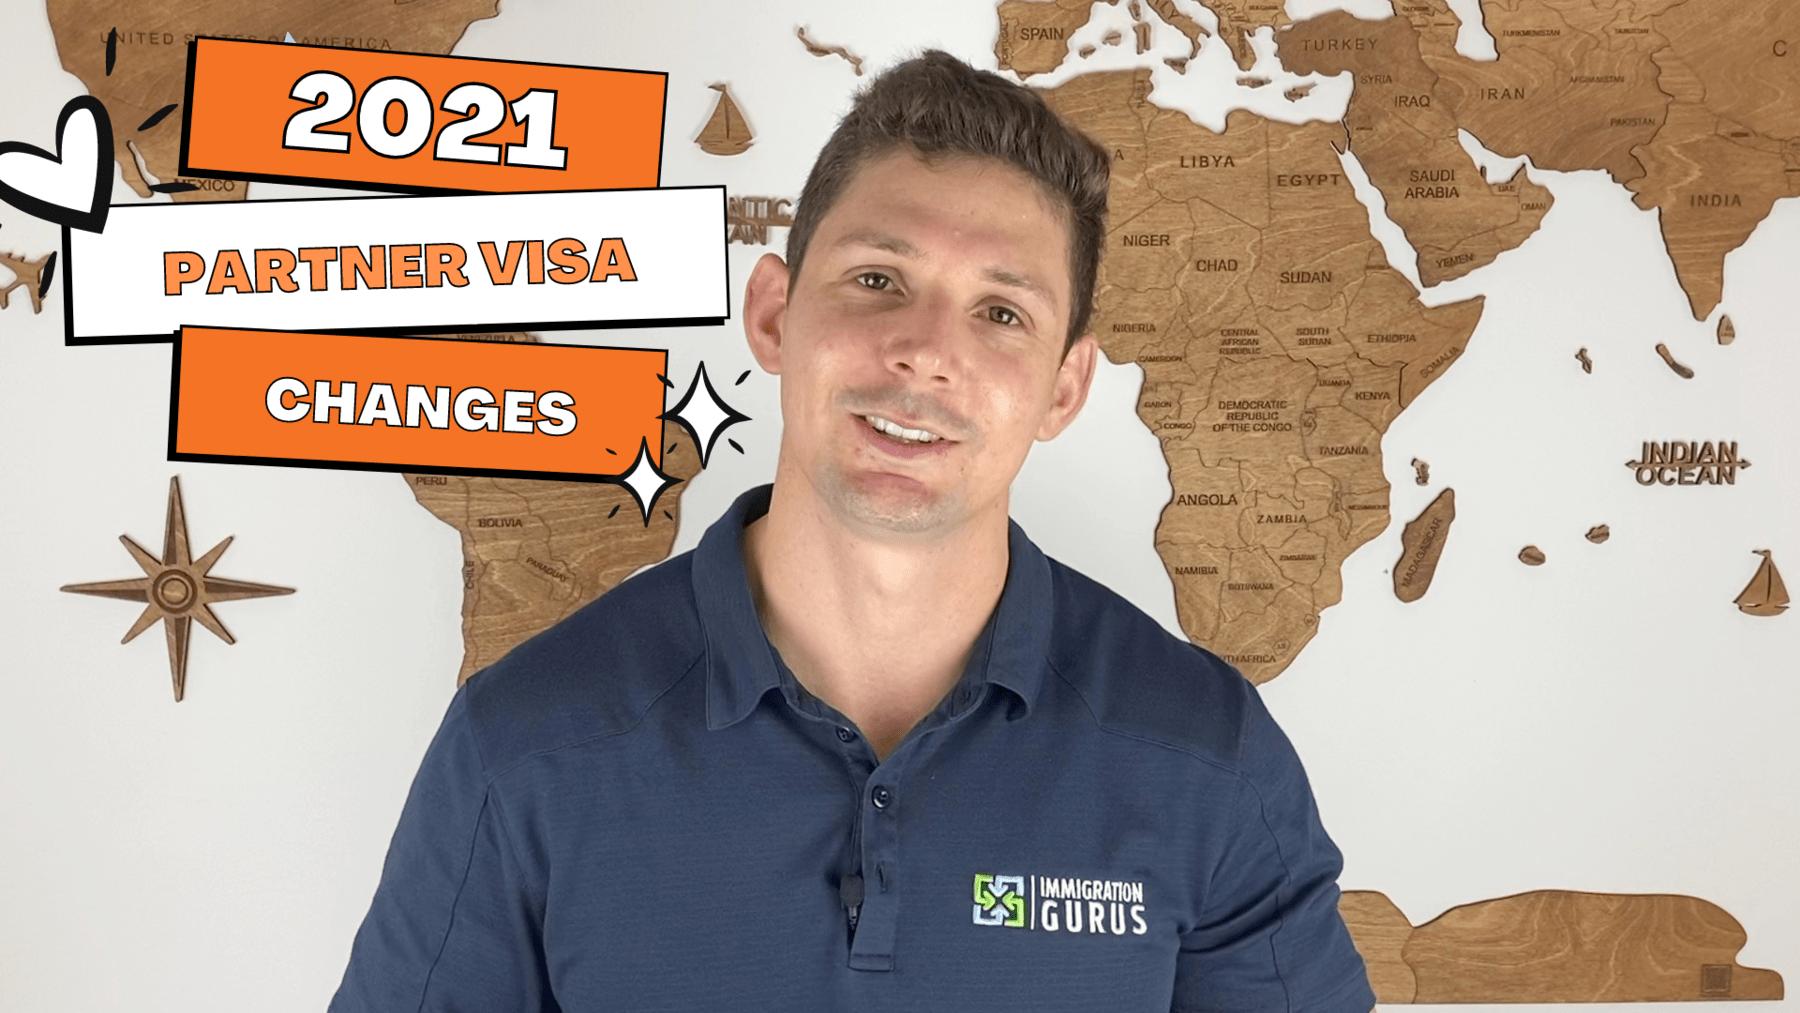 Partner_Visa_Reforms2021